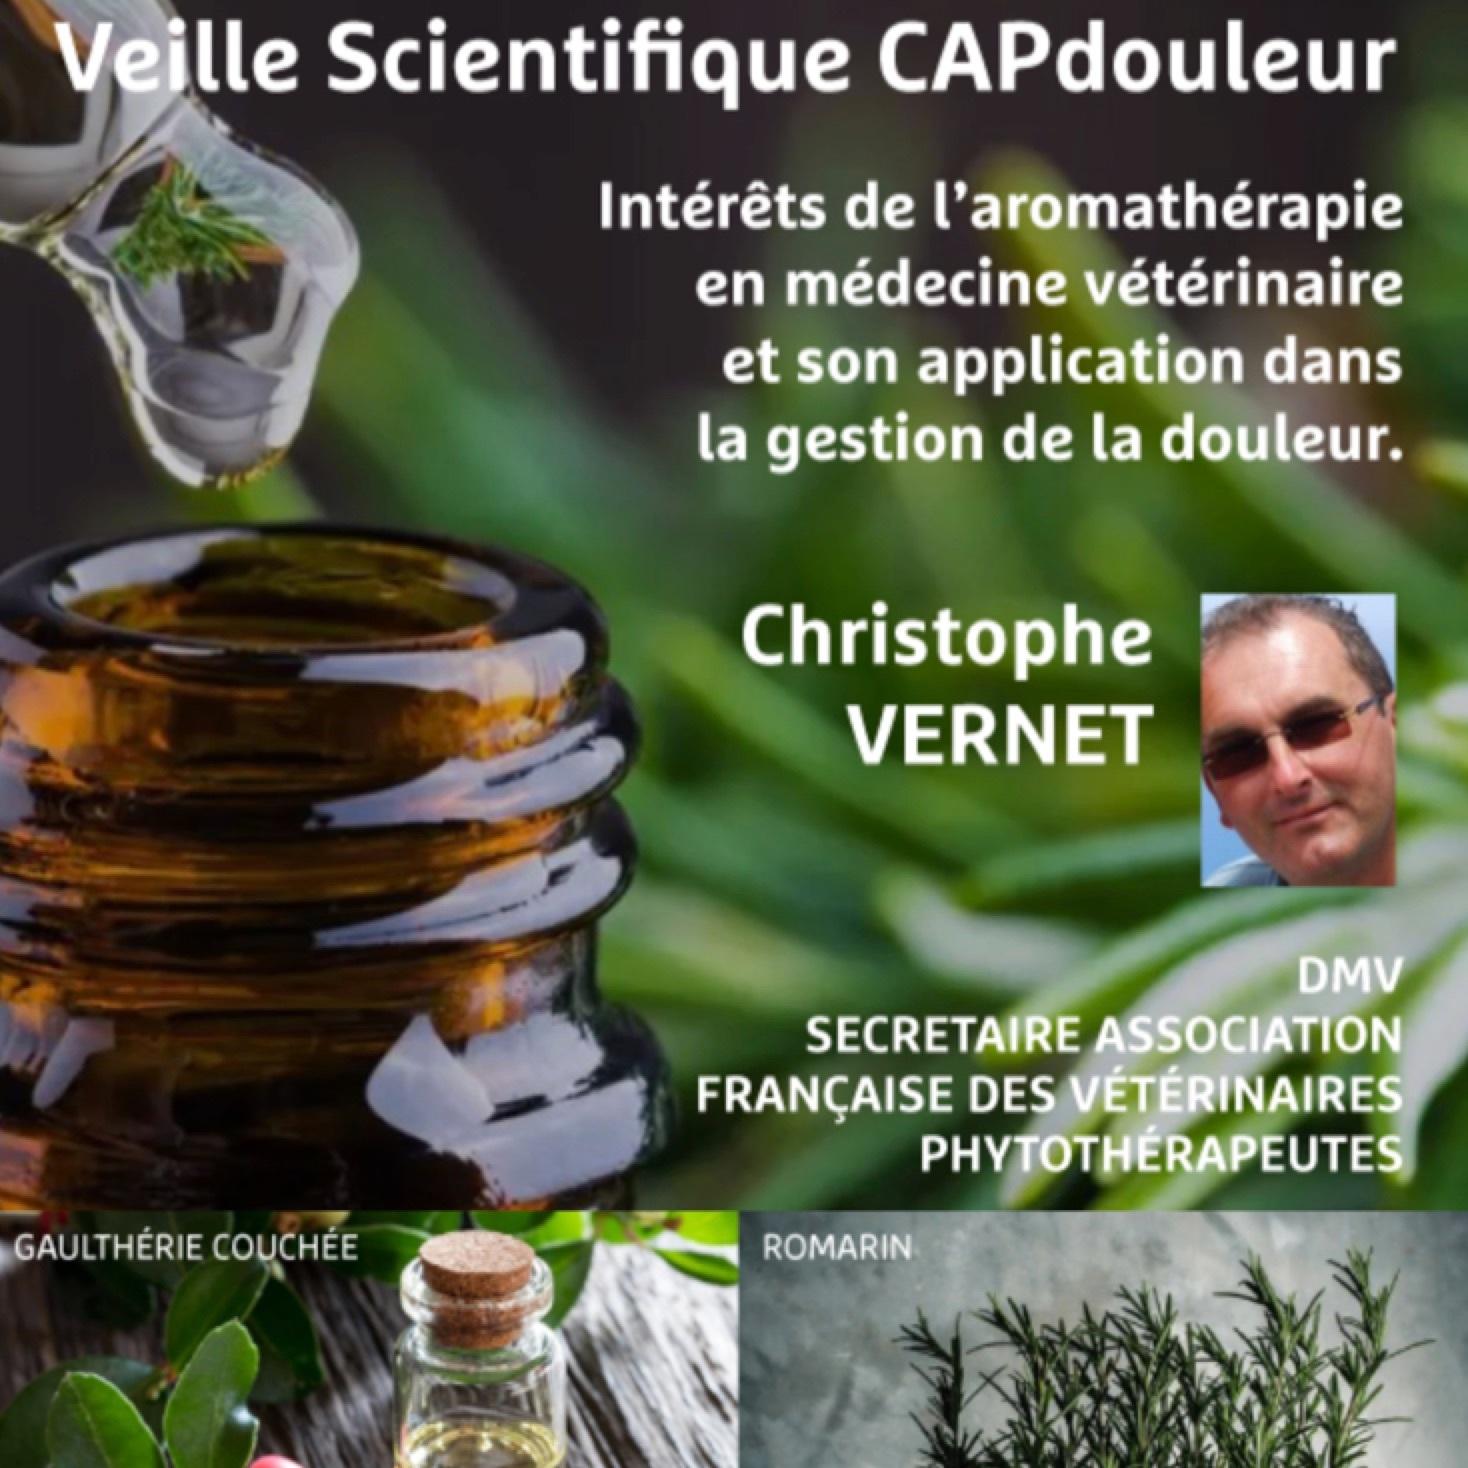 6 JUIN 2019 - Intérêts de l'aromathérapiePartenariat Huiles Essentielles CEVA